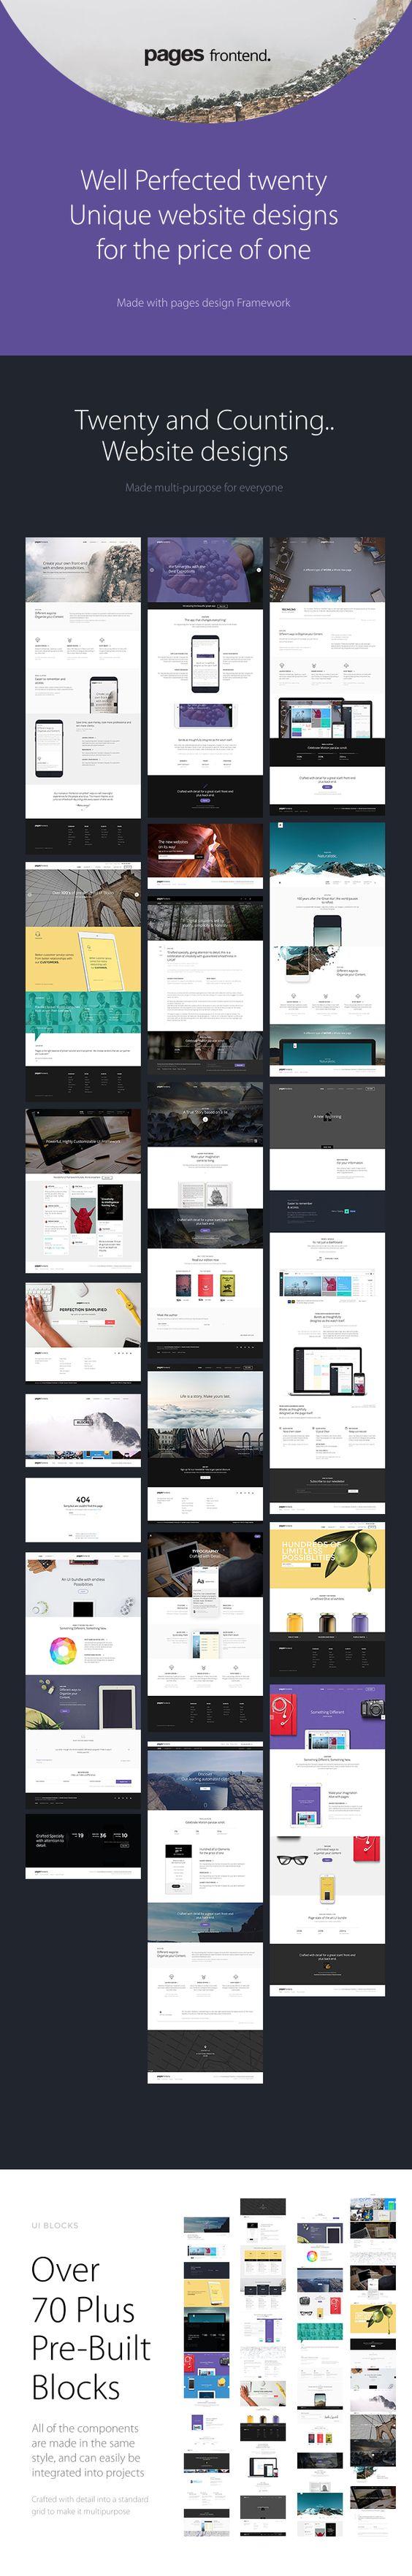 Pages - Multi-Purpose HTML5 Website Template | Web design ...